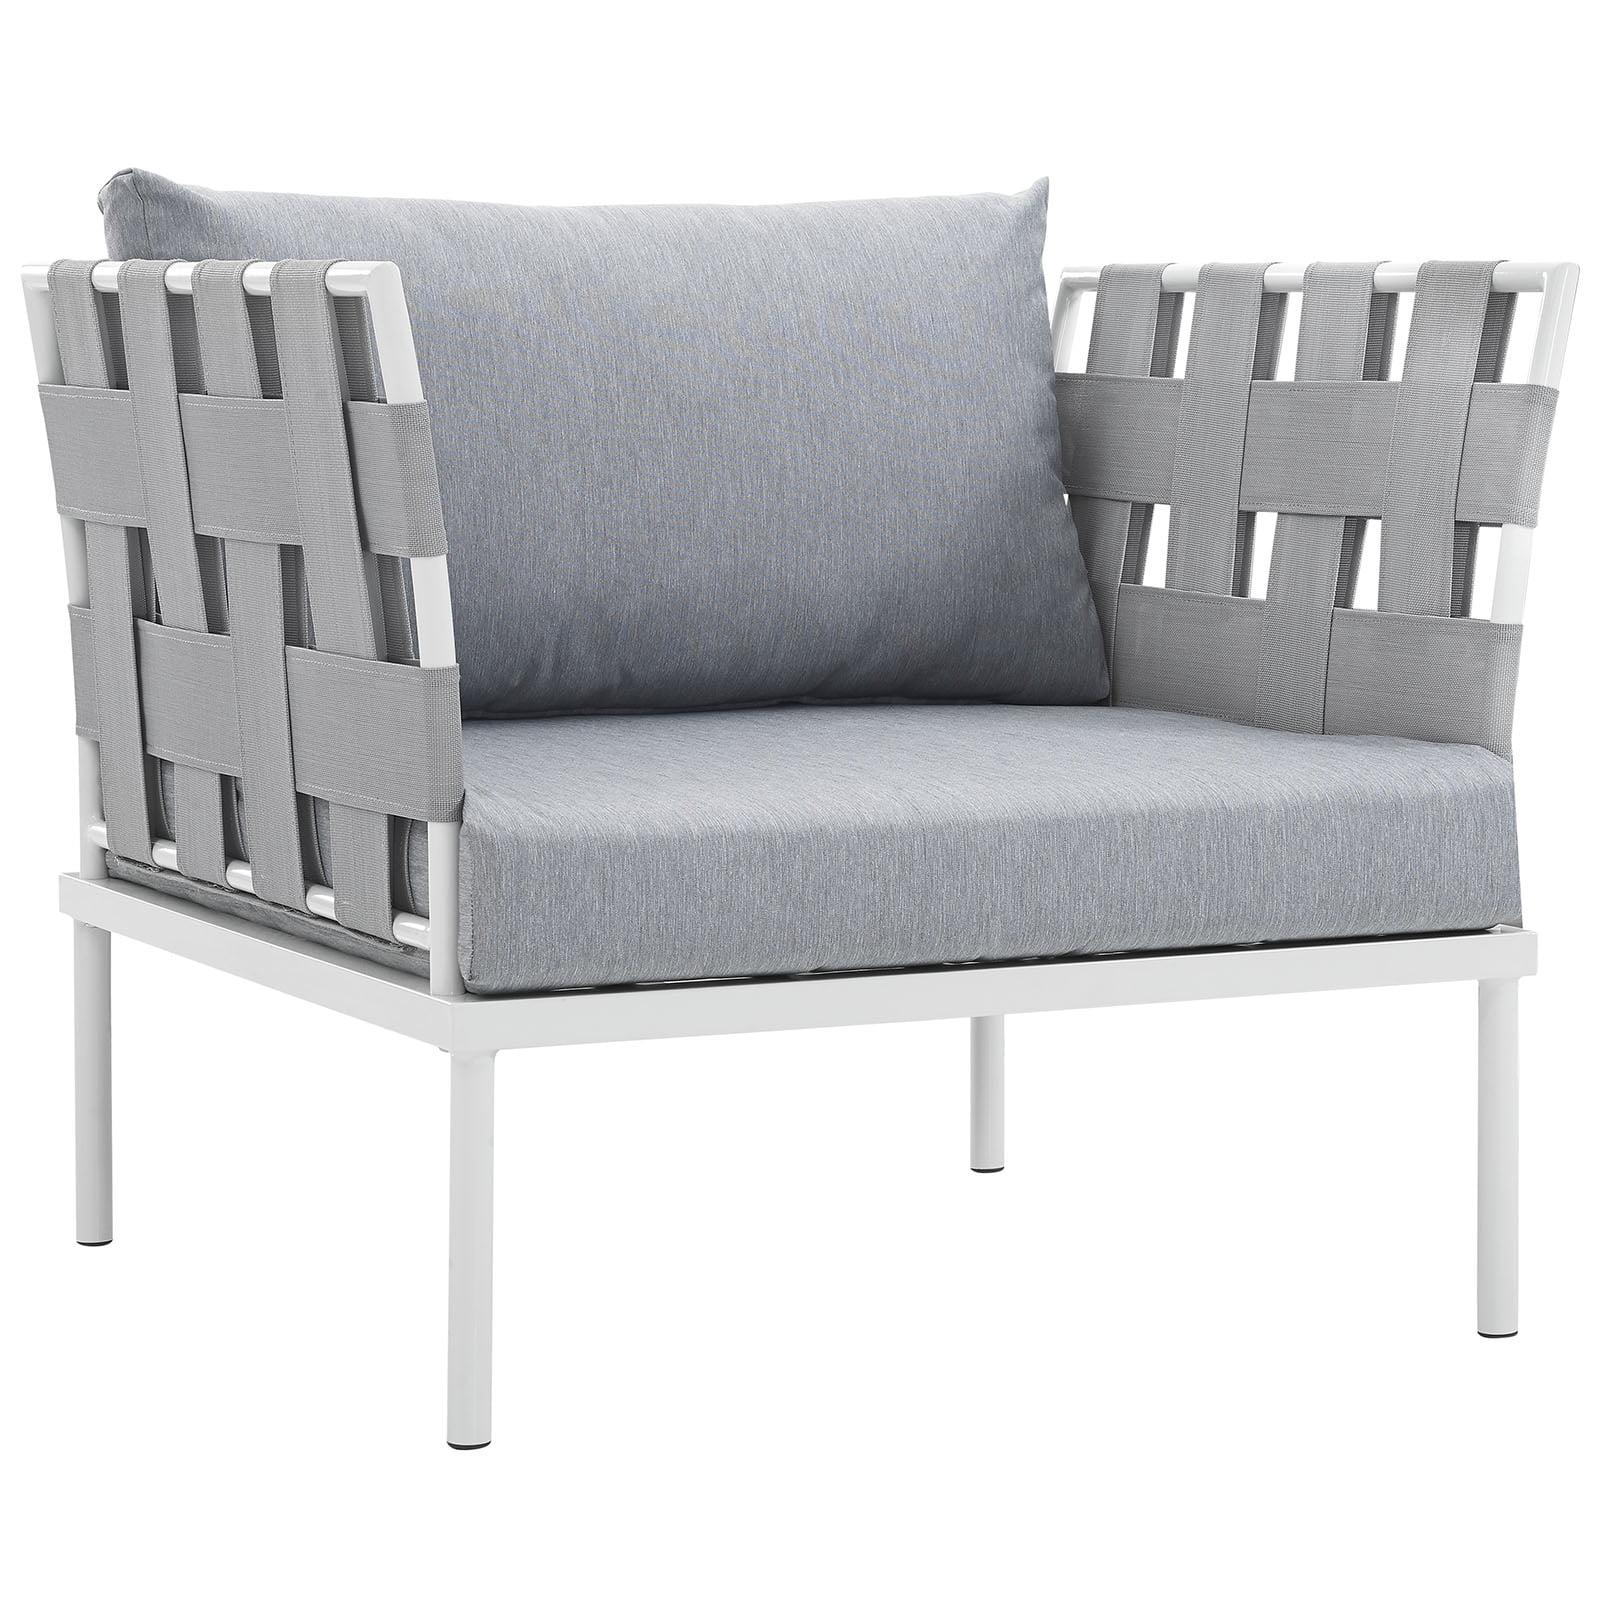 Modern Contemporary Urban Design Outdoor Patio Balcony Lounge Chair, Grey White Gray, Rattan